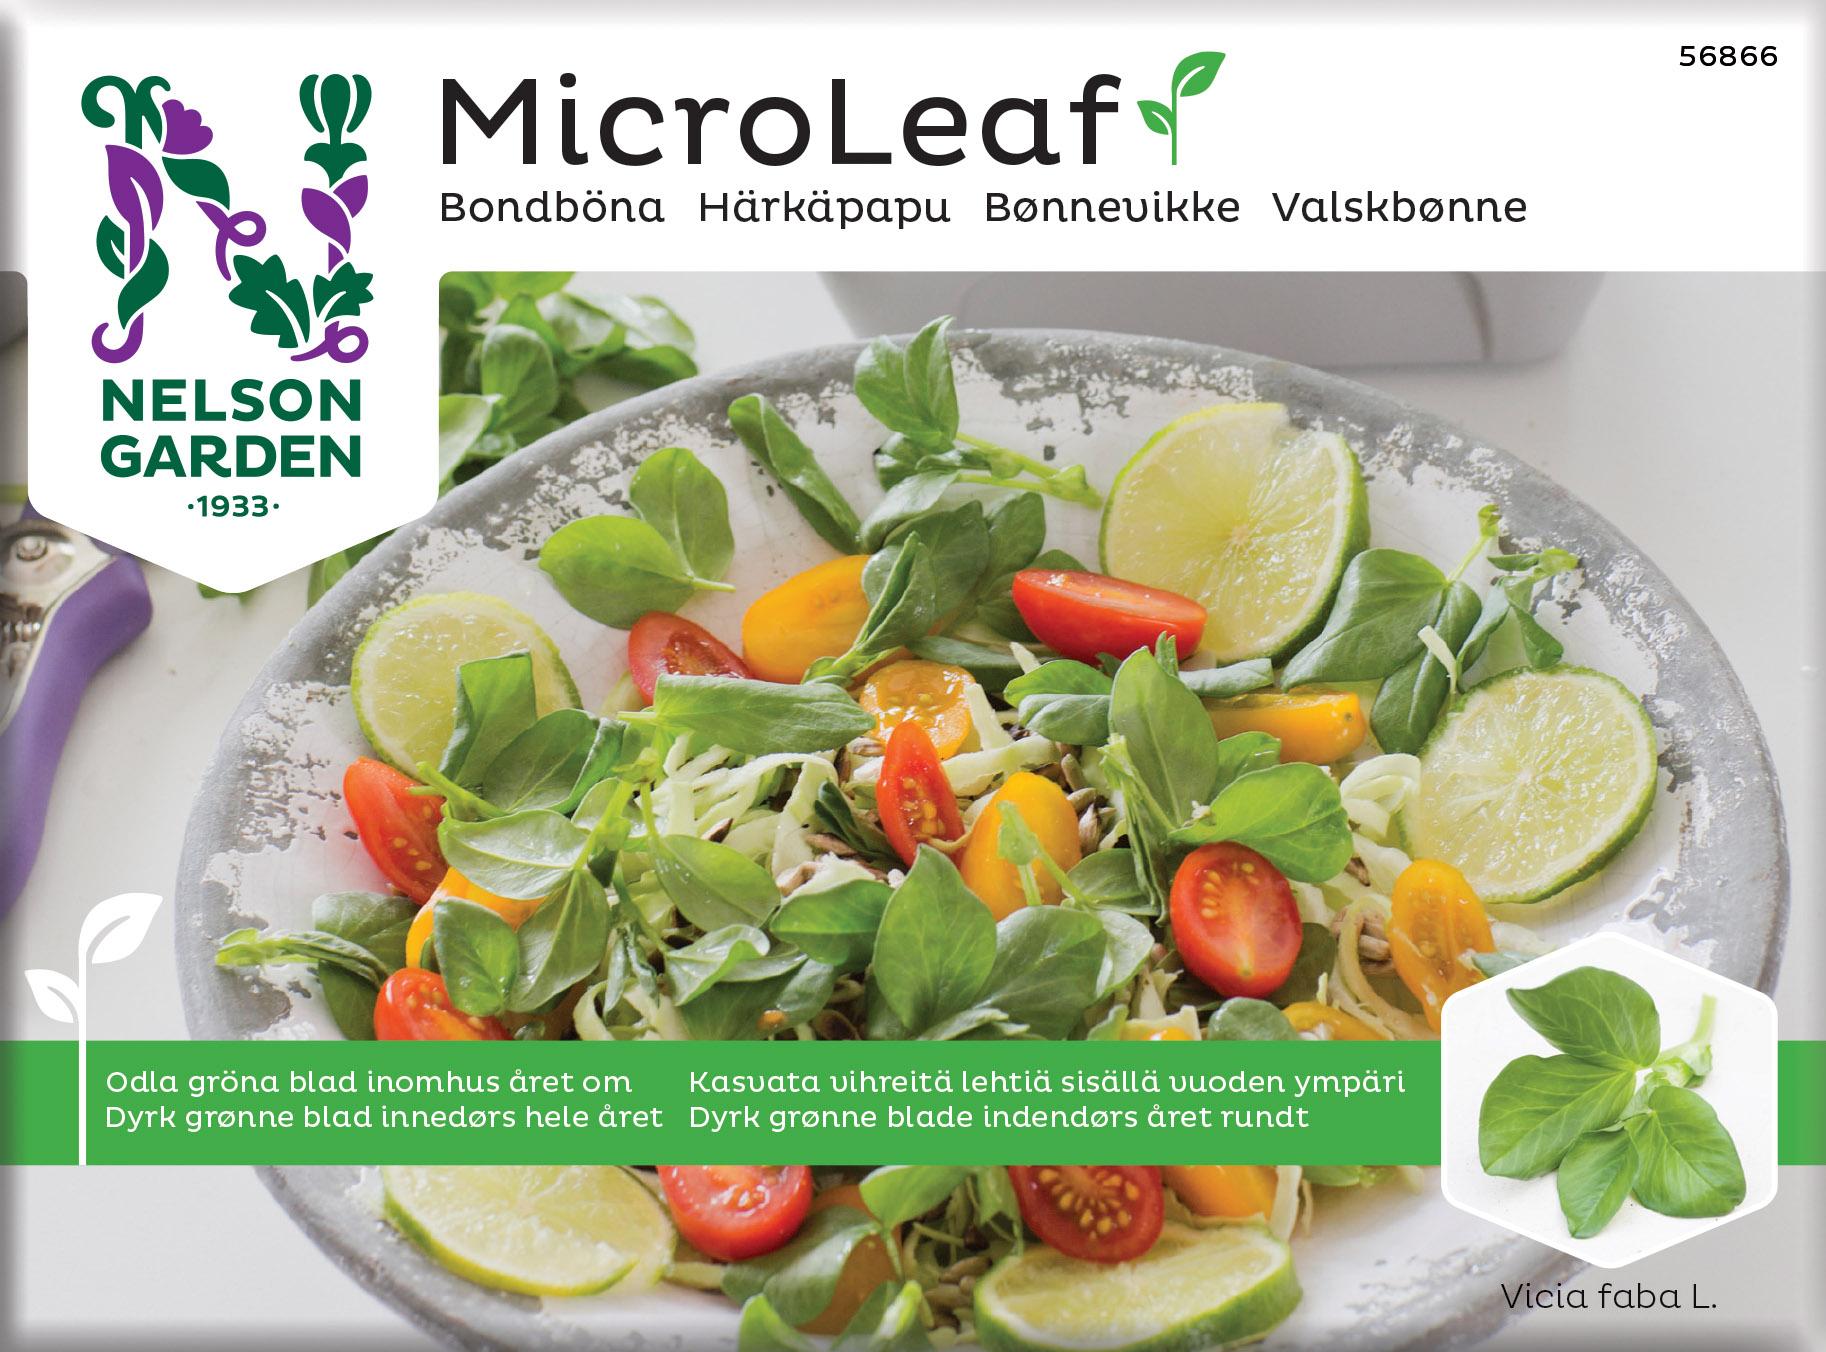 Produktbild på Micro Leaf Bondböna